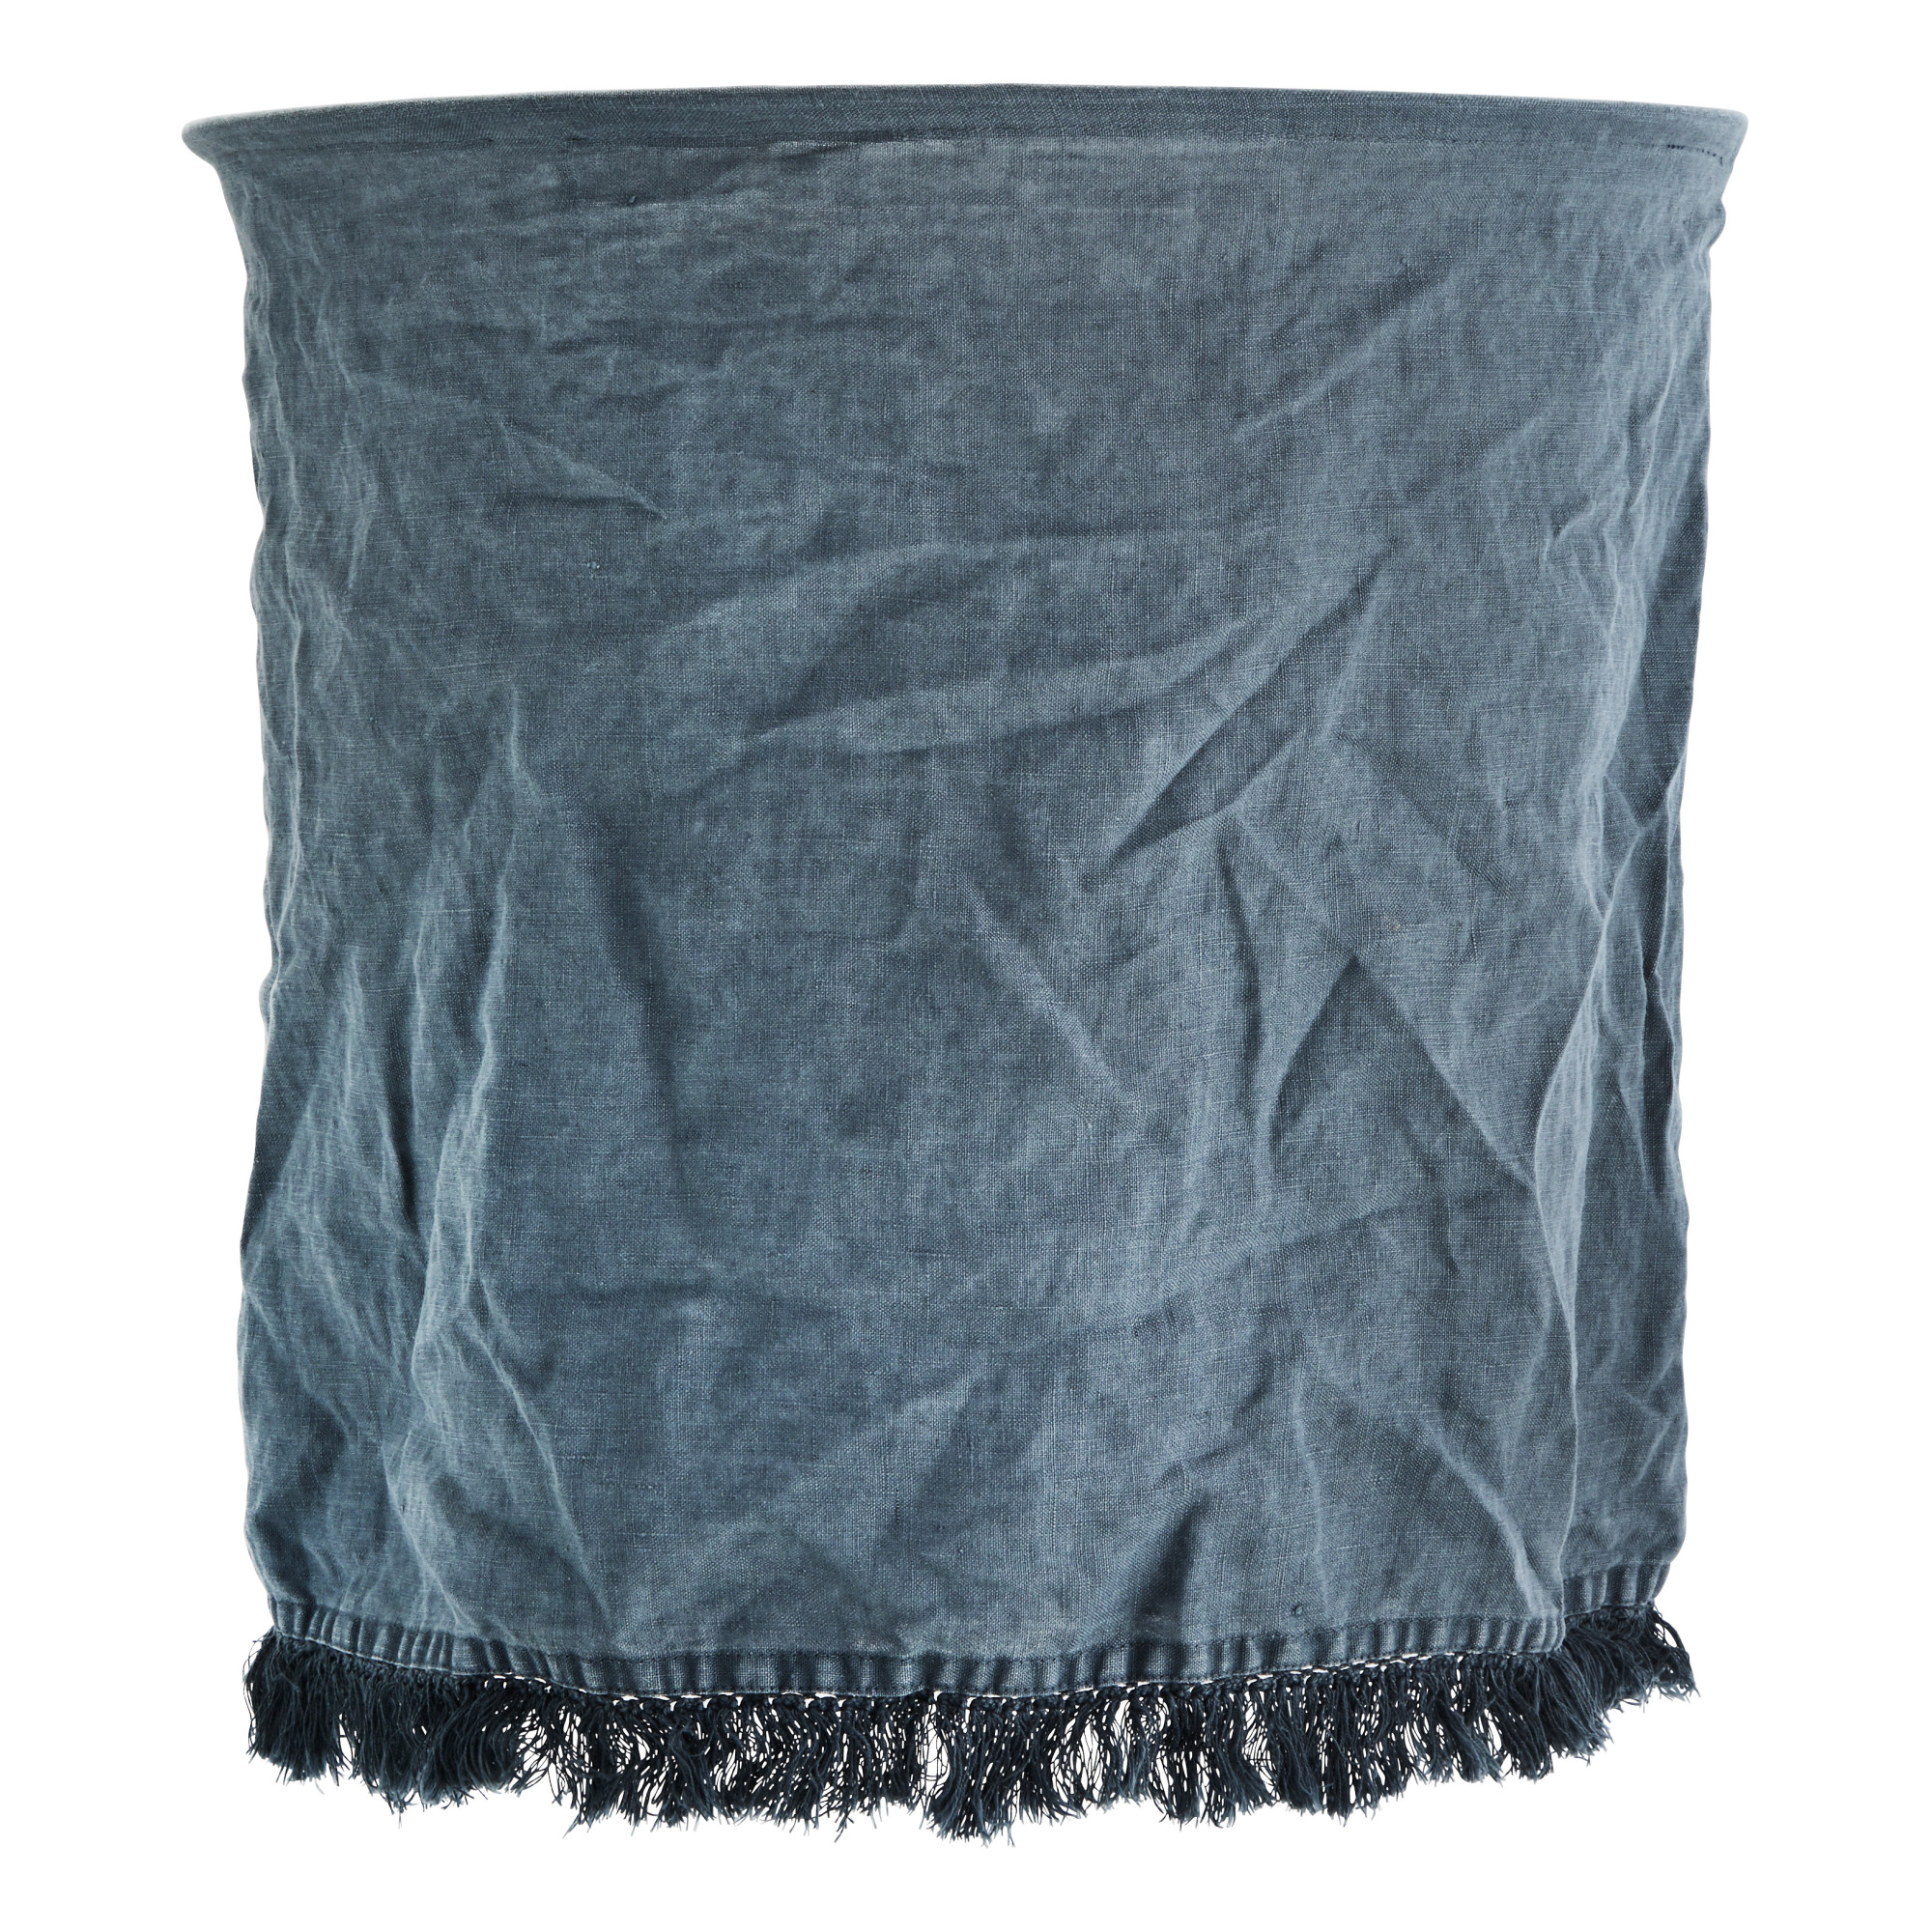 Abat-jour in lino con frange